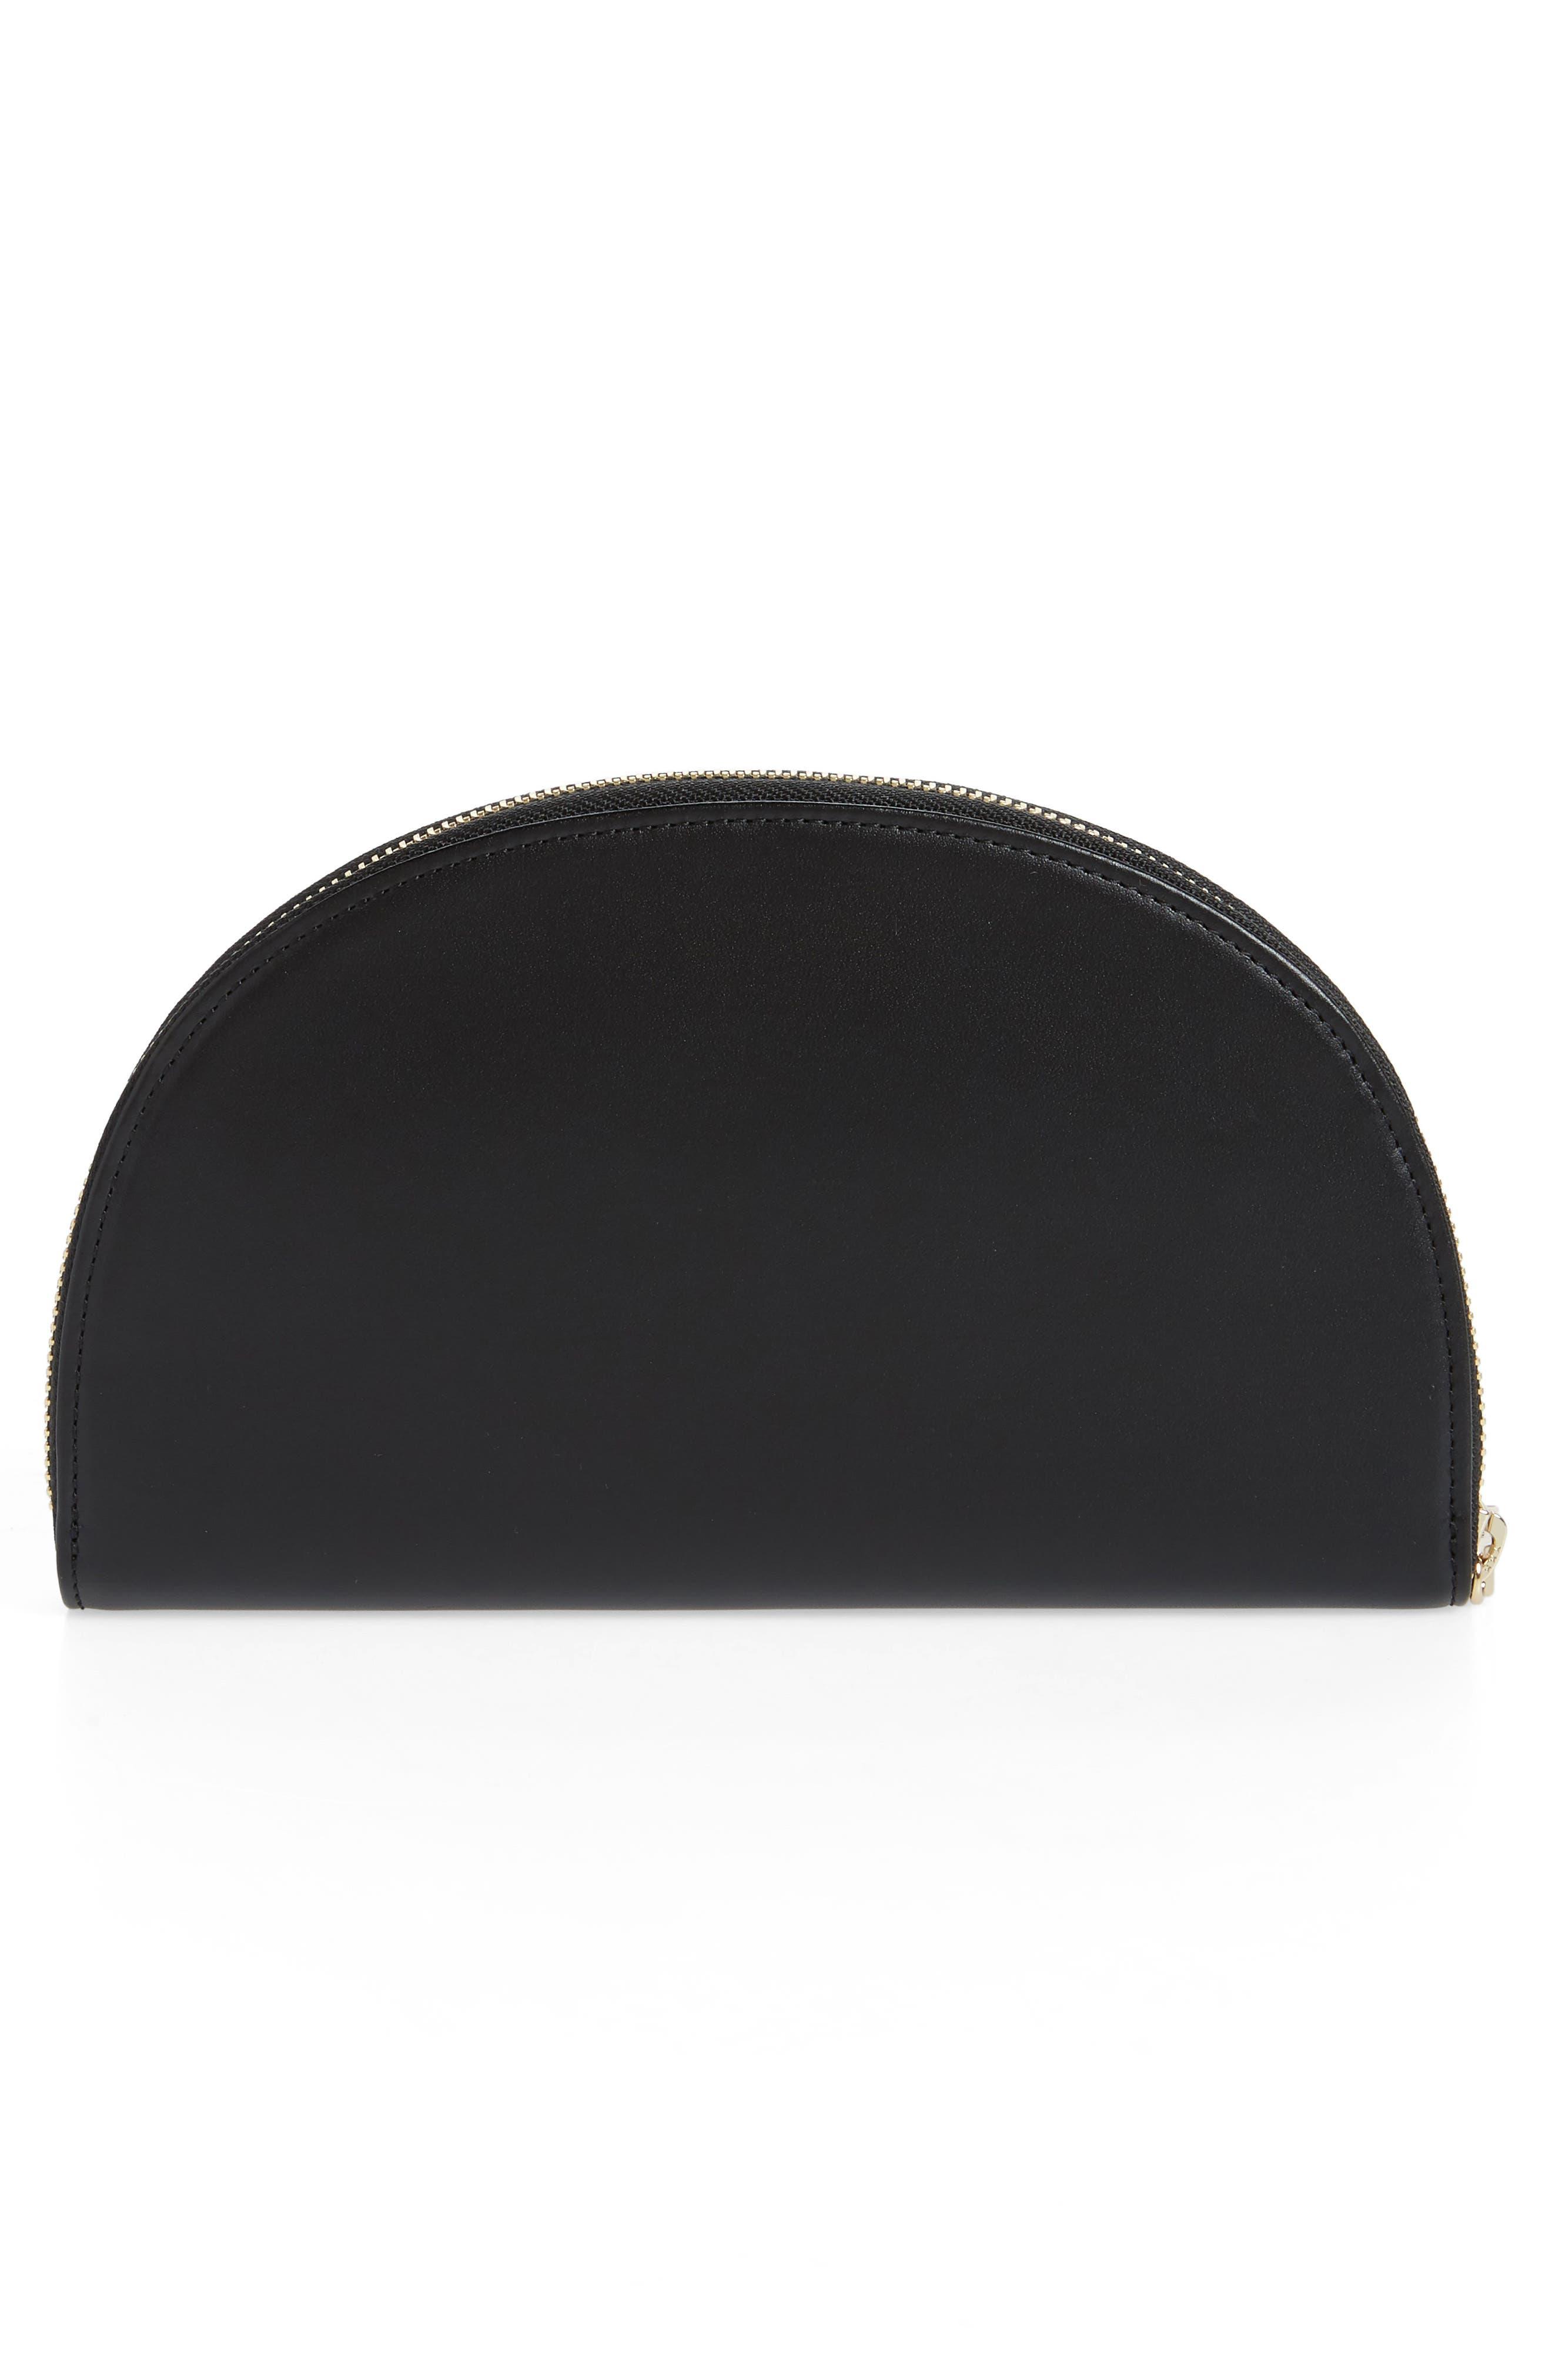 Dia Continental Mirror Wallet,                             Alternate thumbnail 3, color,                             TRUE BLACK